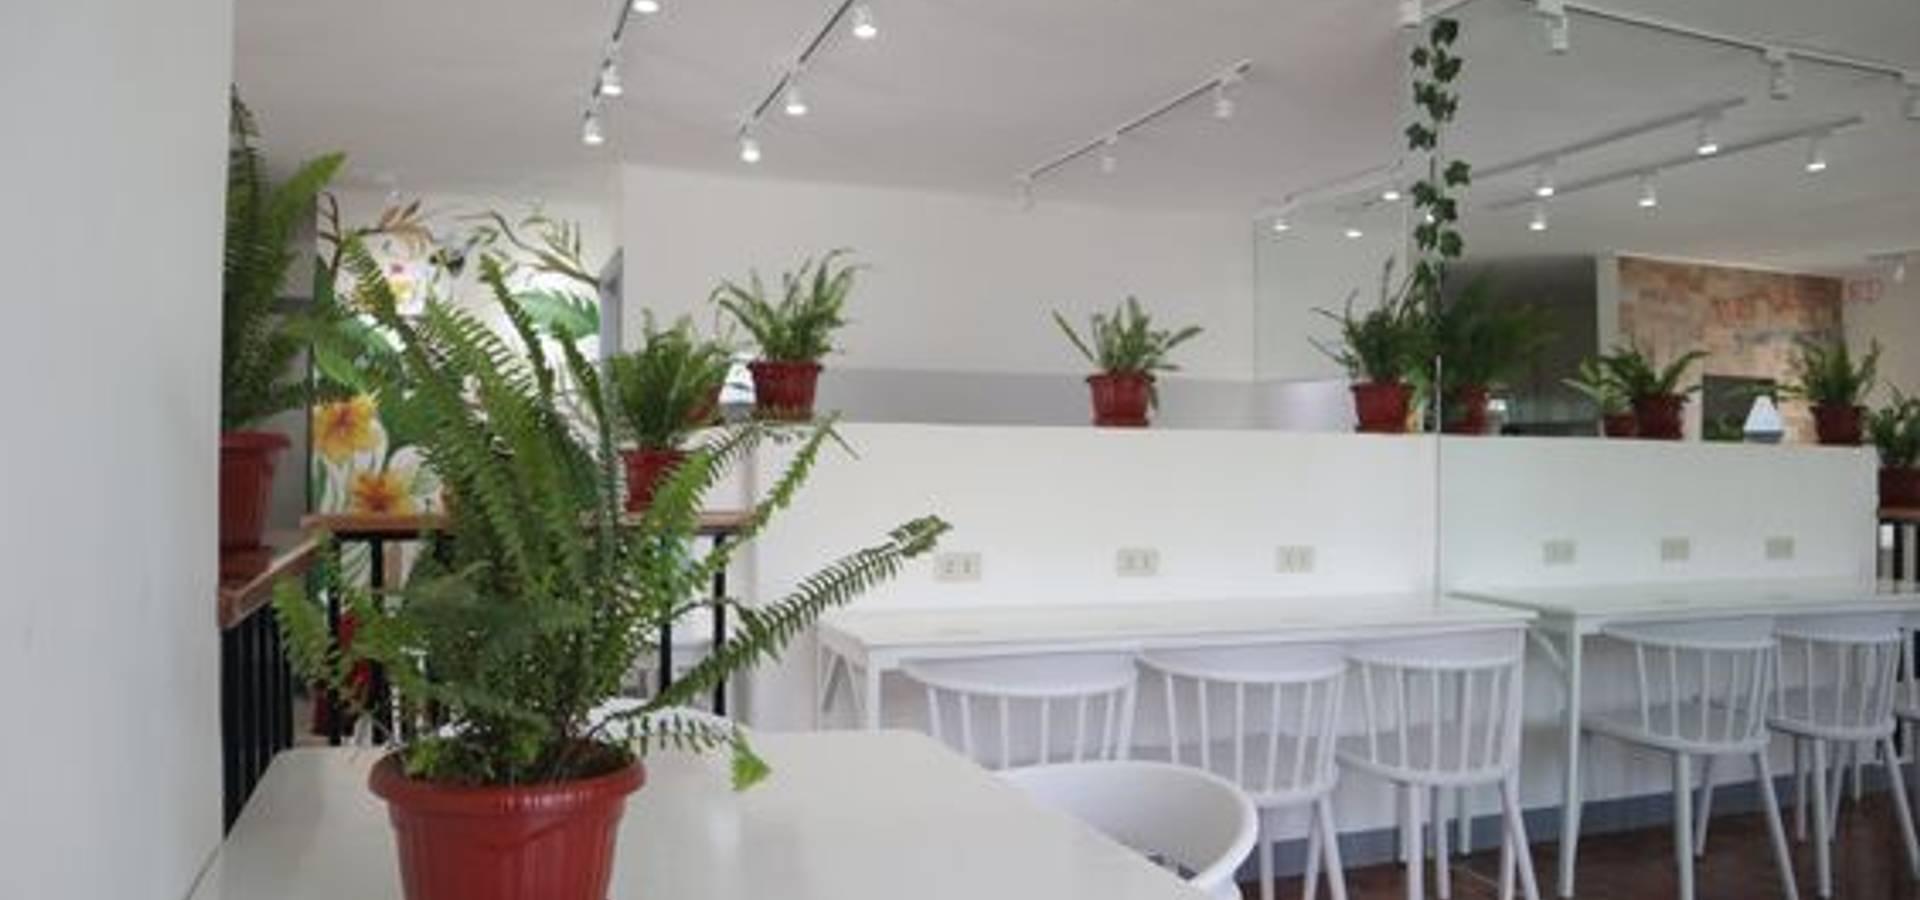 Manalese Architecture + Design